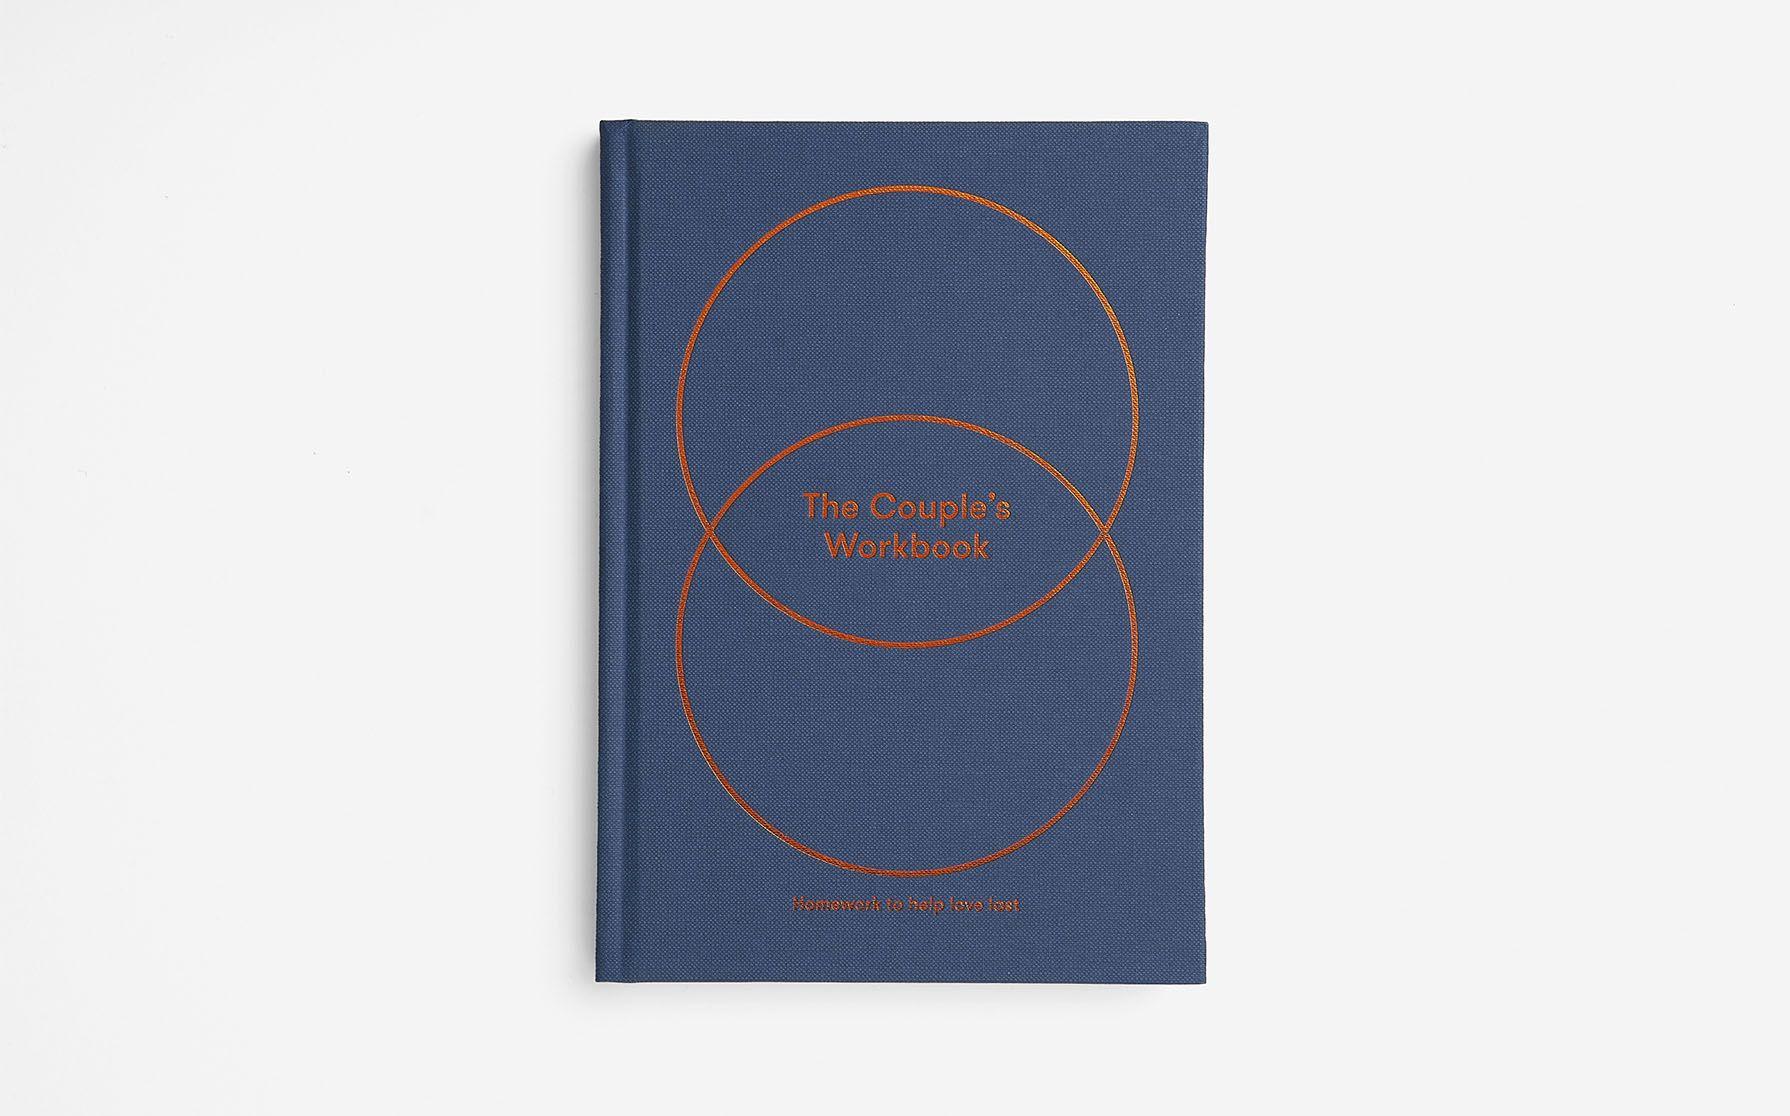 The School of Life - Couple's Workbook